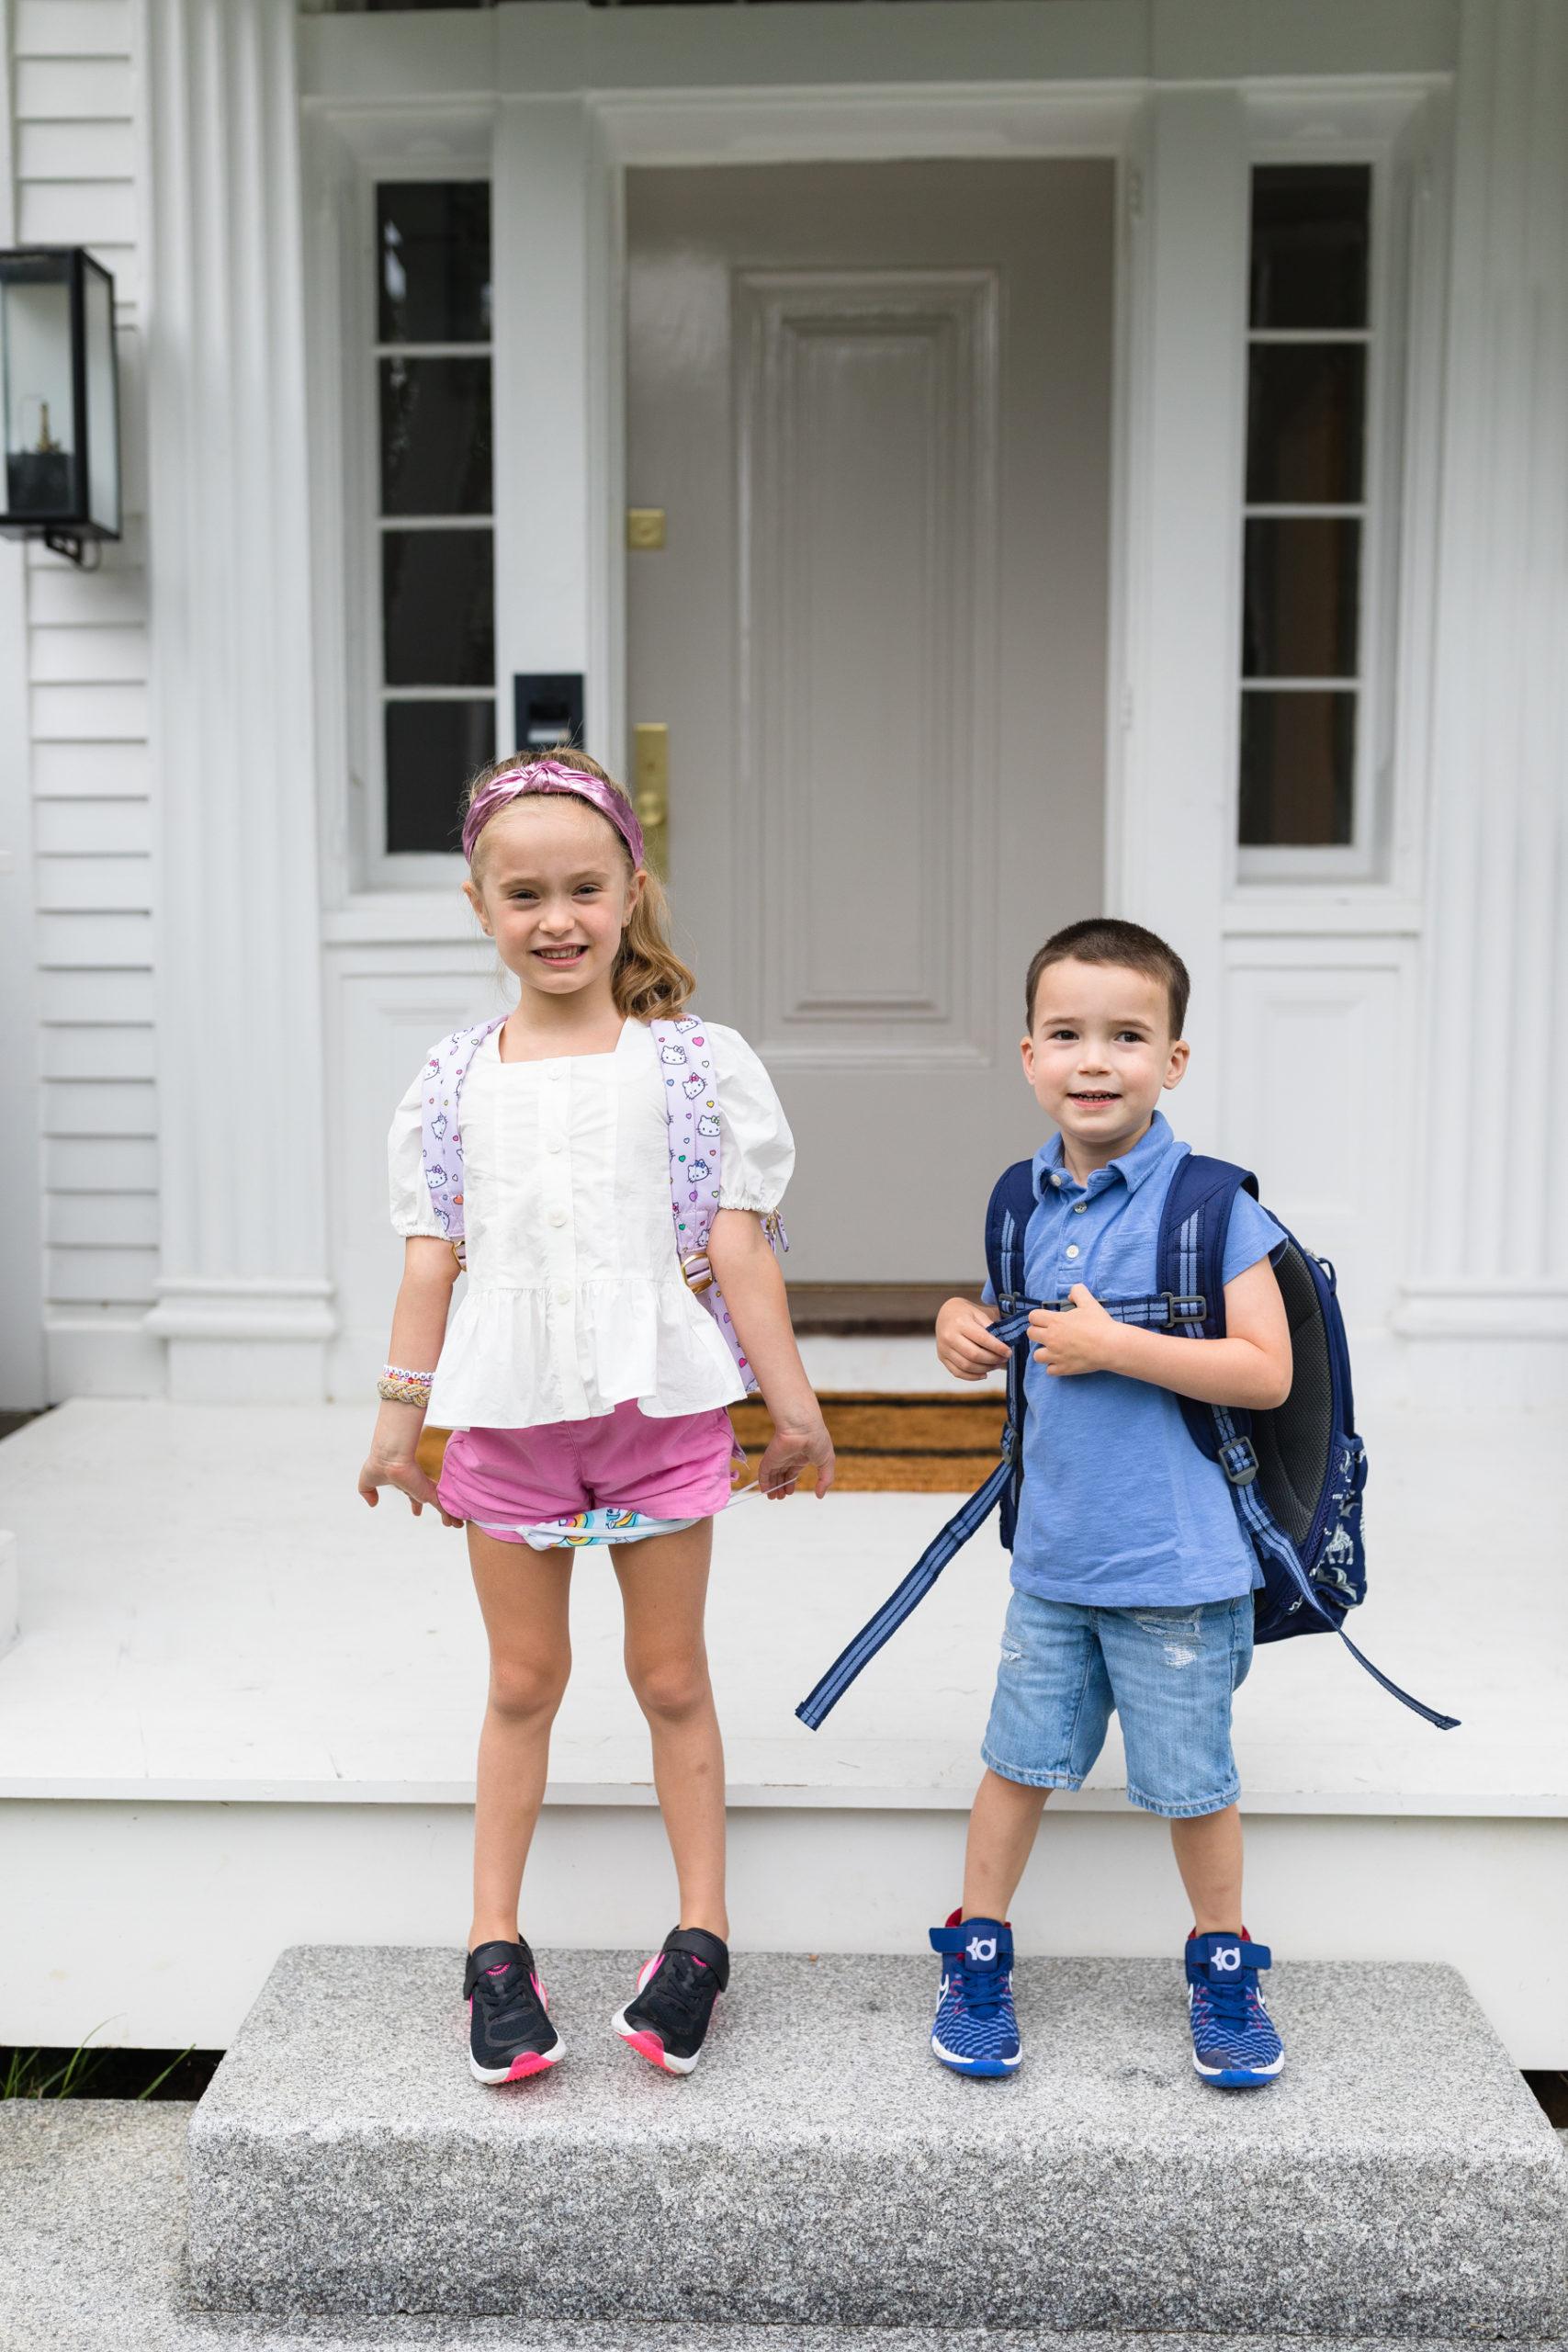 Eva Amurri shares how she's preparing for the school year